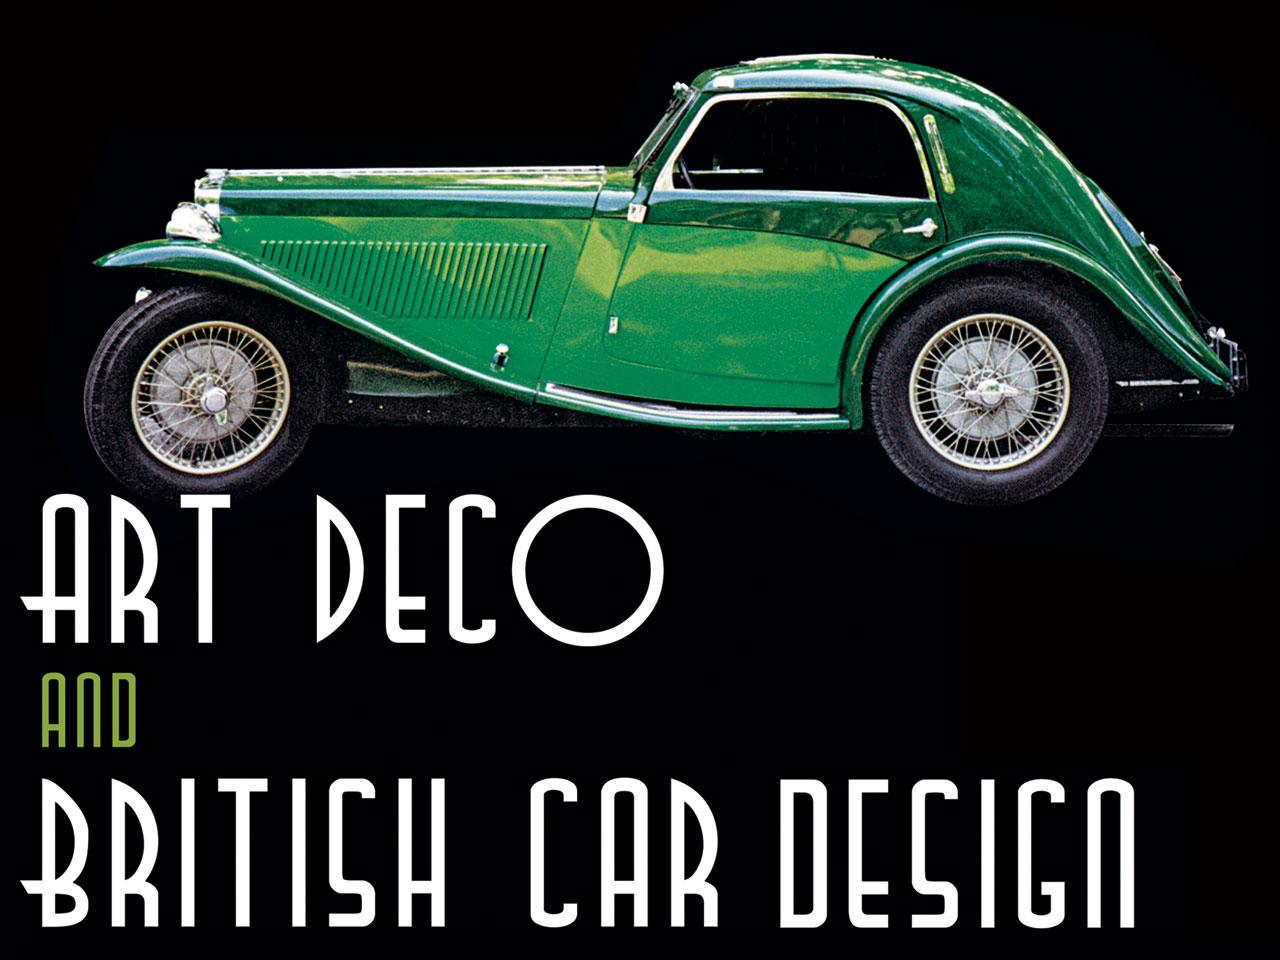 art deco and british car design. Black Bedroom Furniture Sets. Home Design Ideas